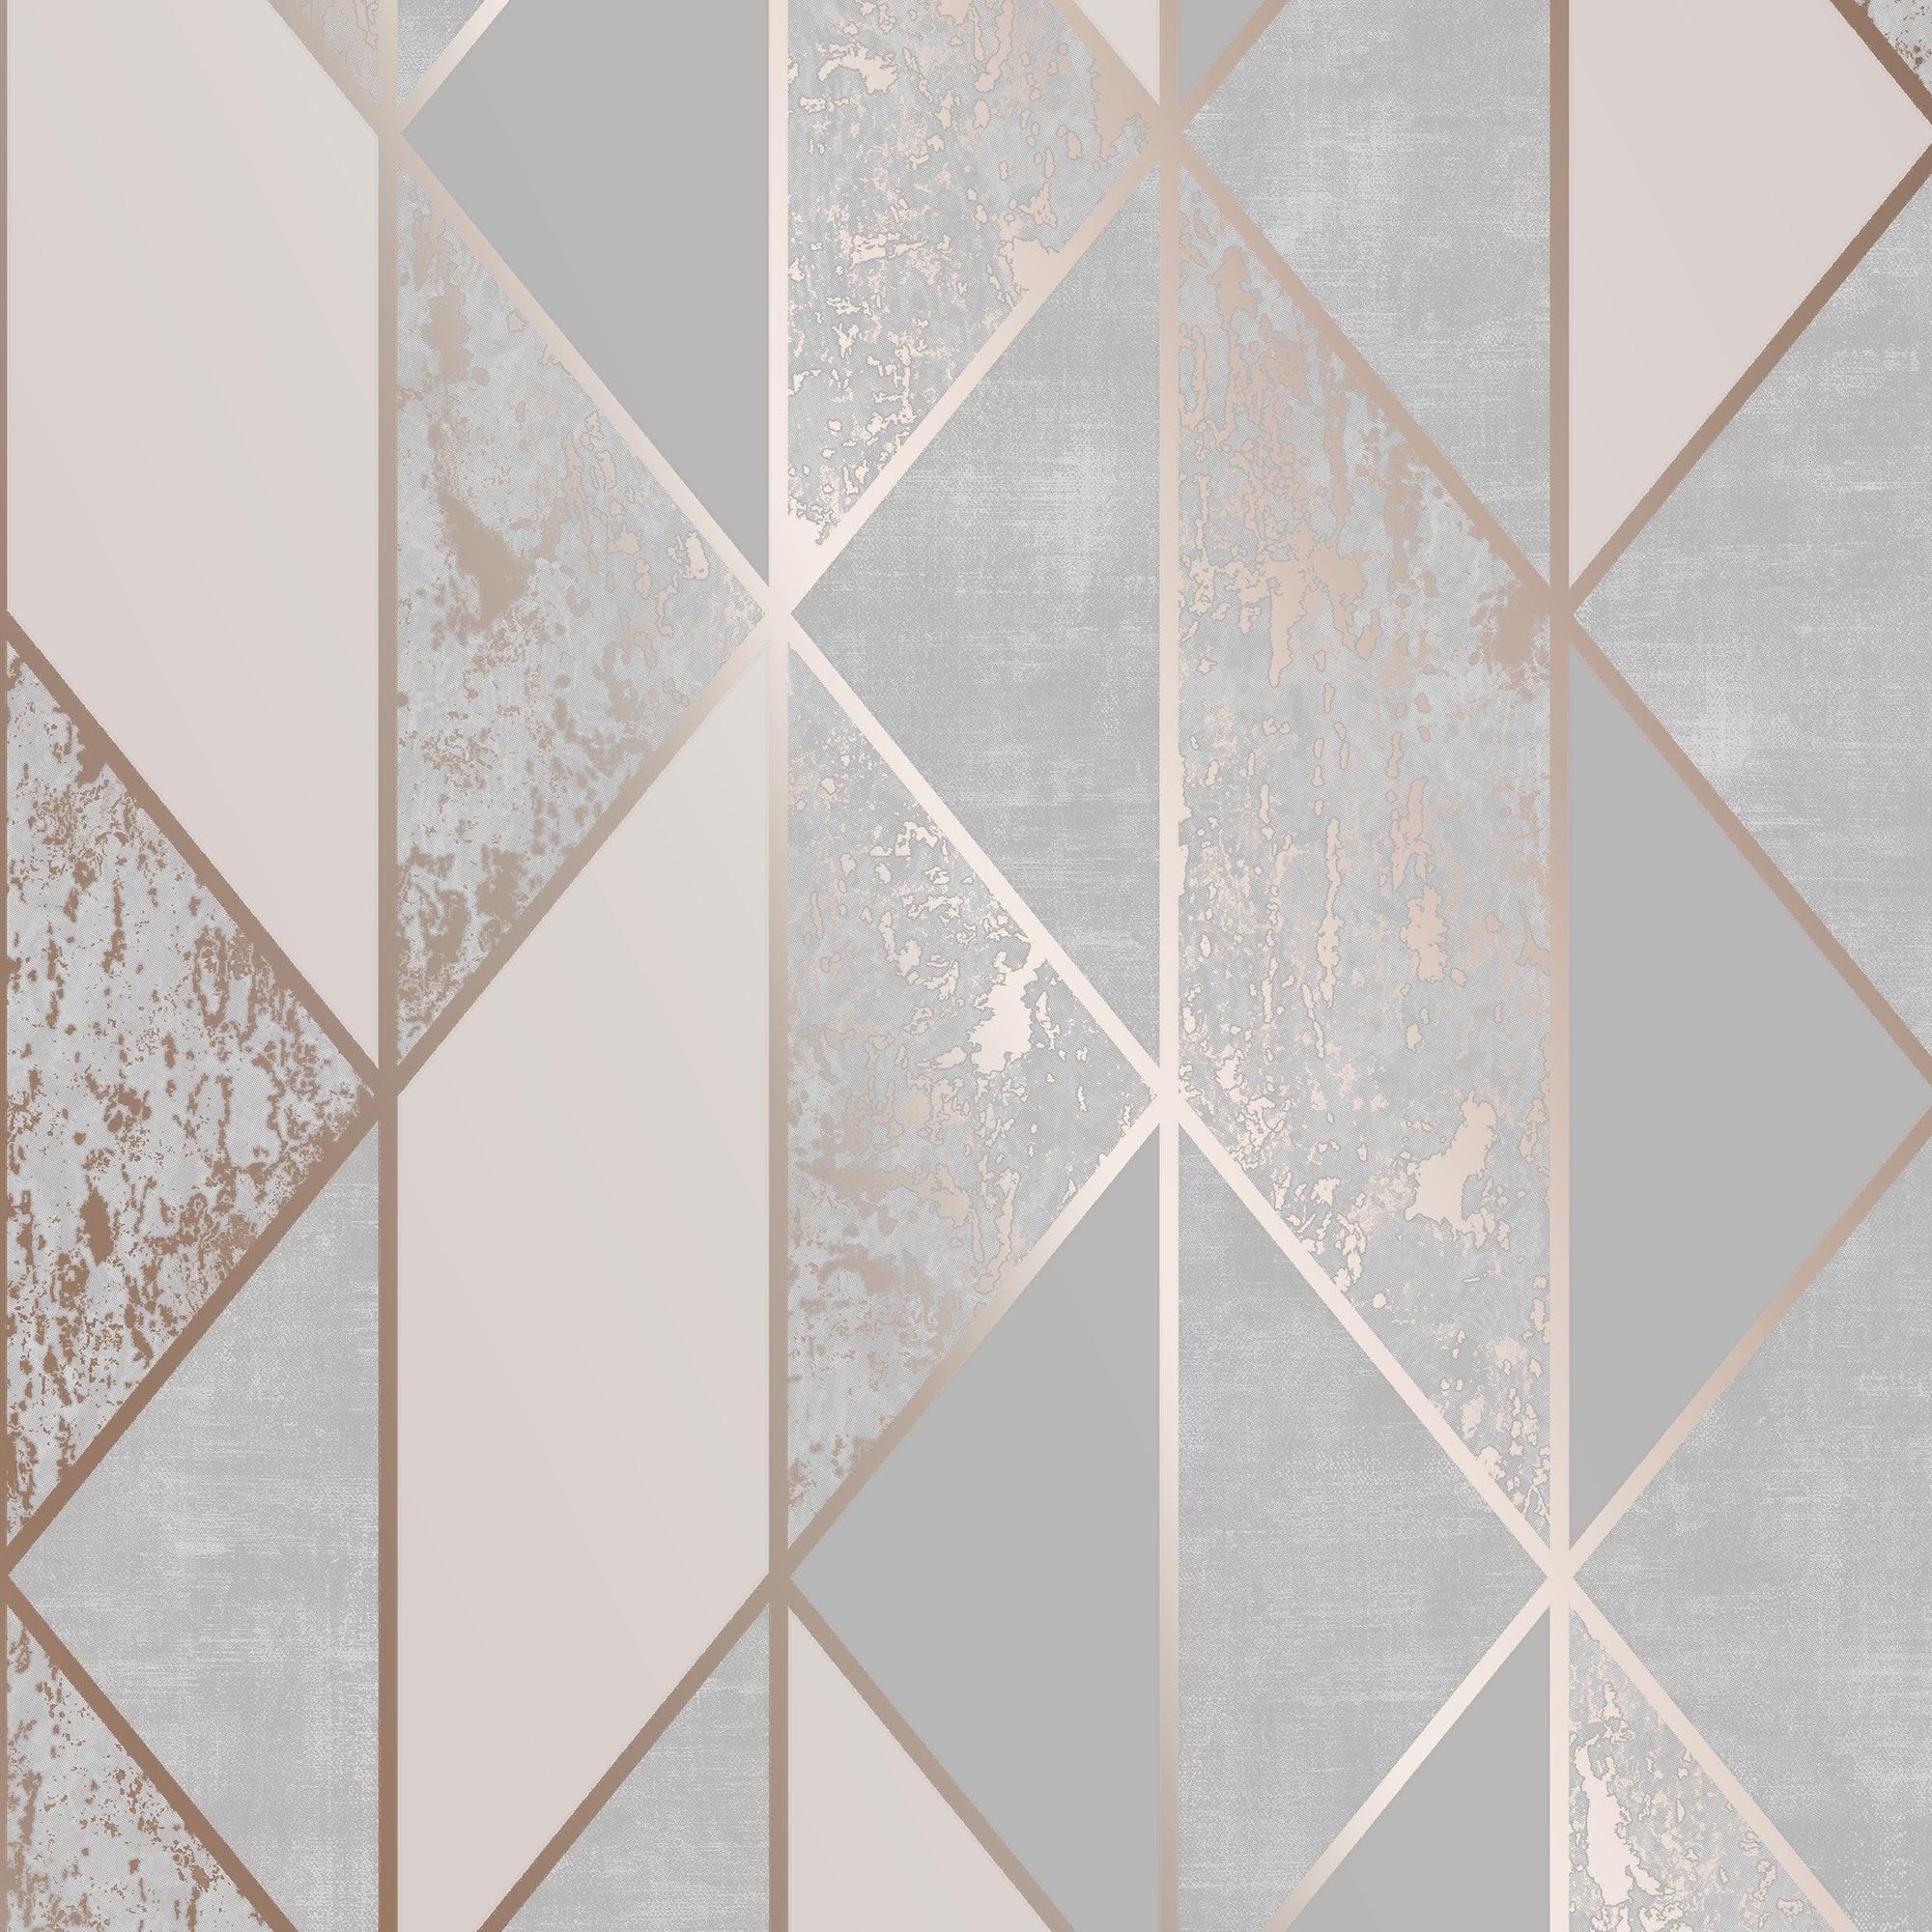 Superfresco Milan Geo Rose Gold Textured Vinyl Metallic Geometric Wallpaper 106407